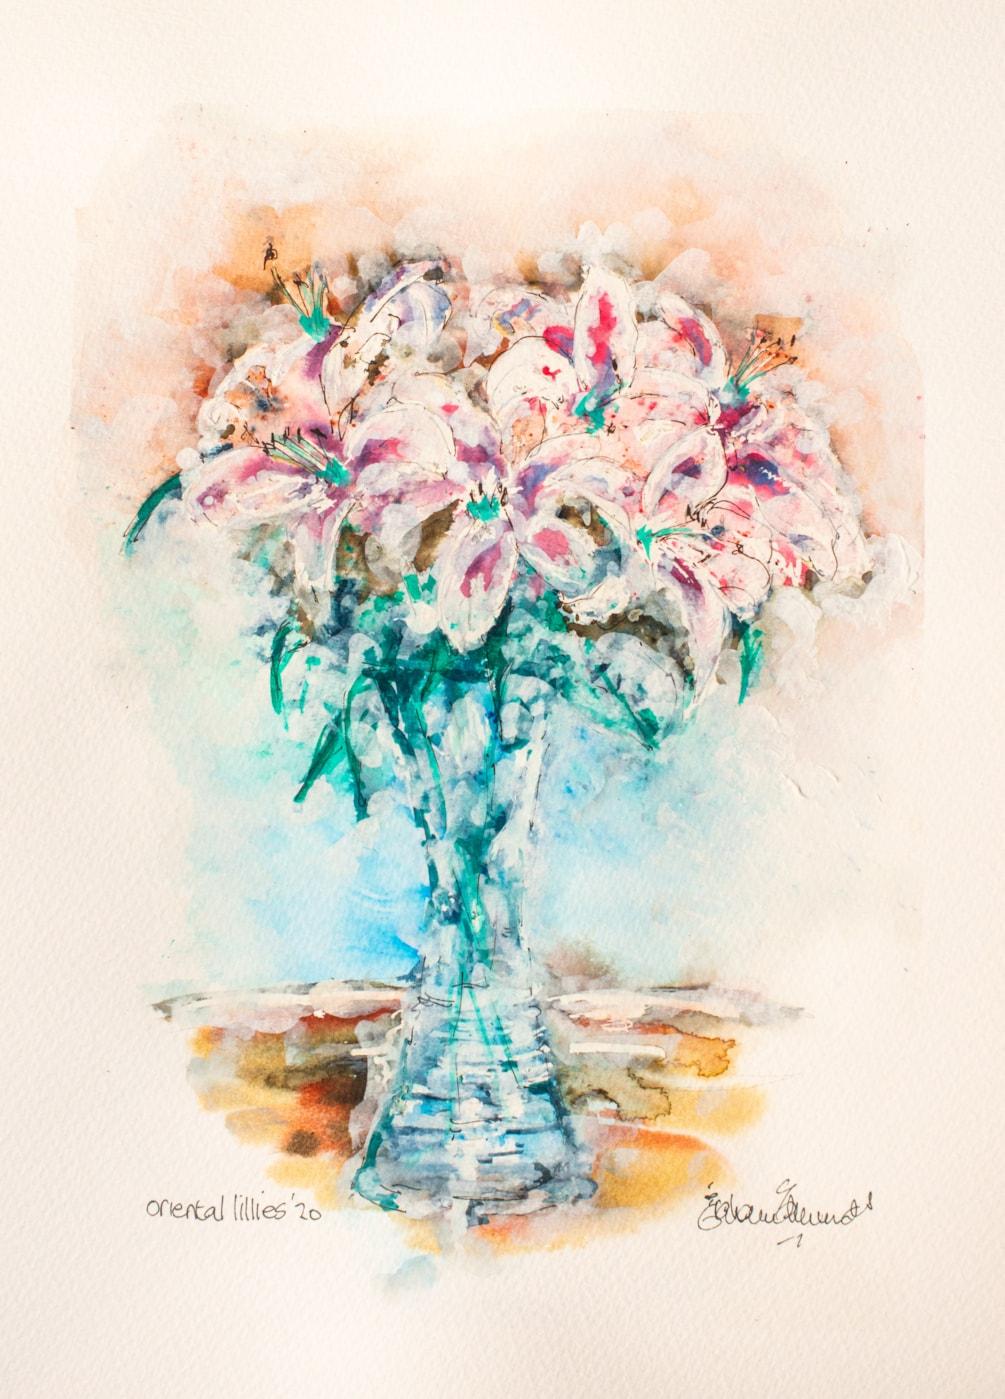 Oriental Lillies '20